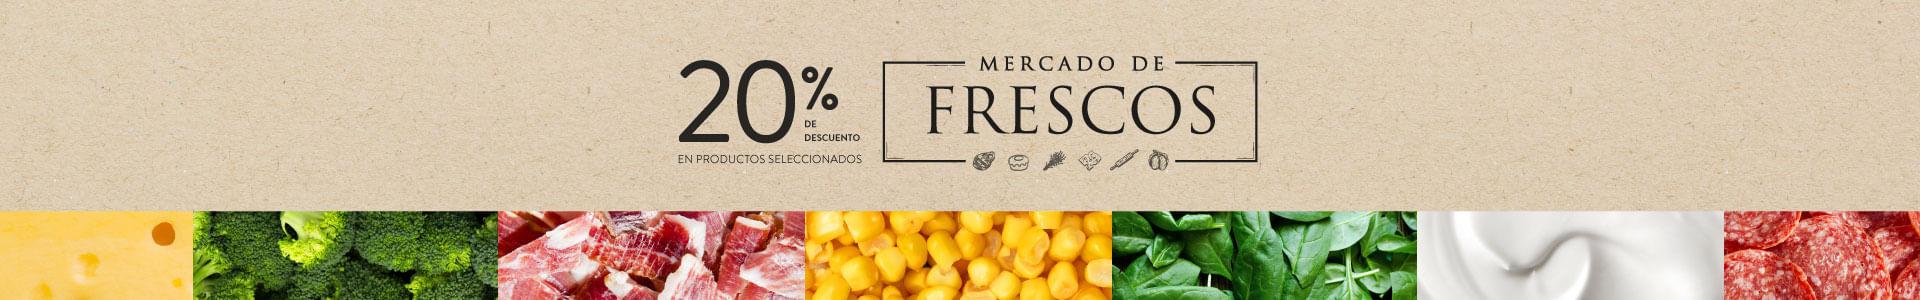 DivisionFrescos##mercadoFrescos##MercadoFrescosHastaAgosto##home_carrousel